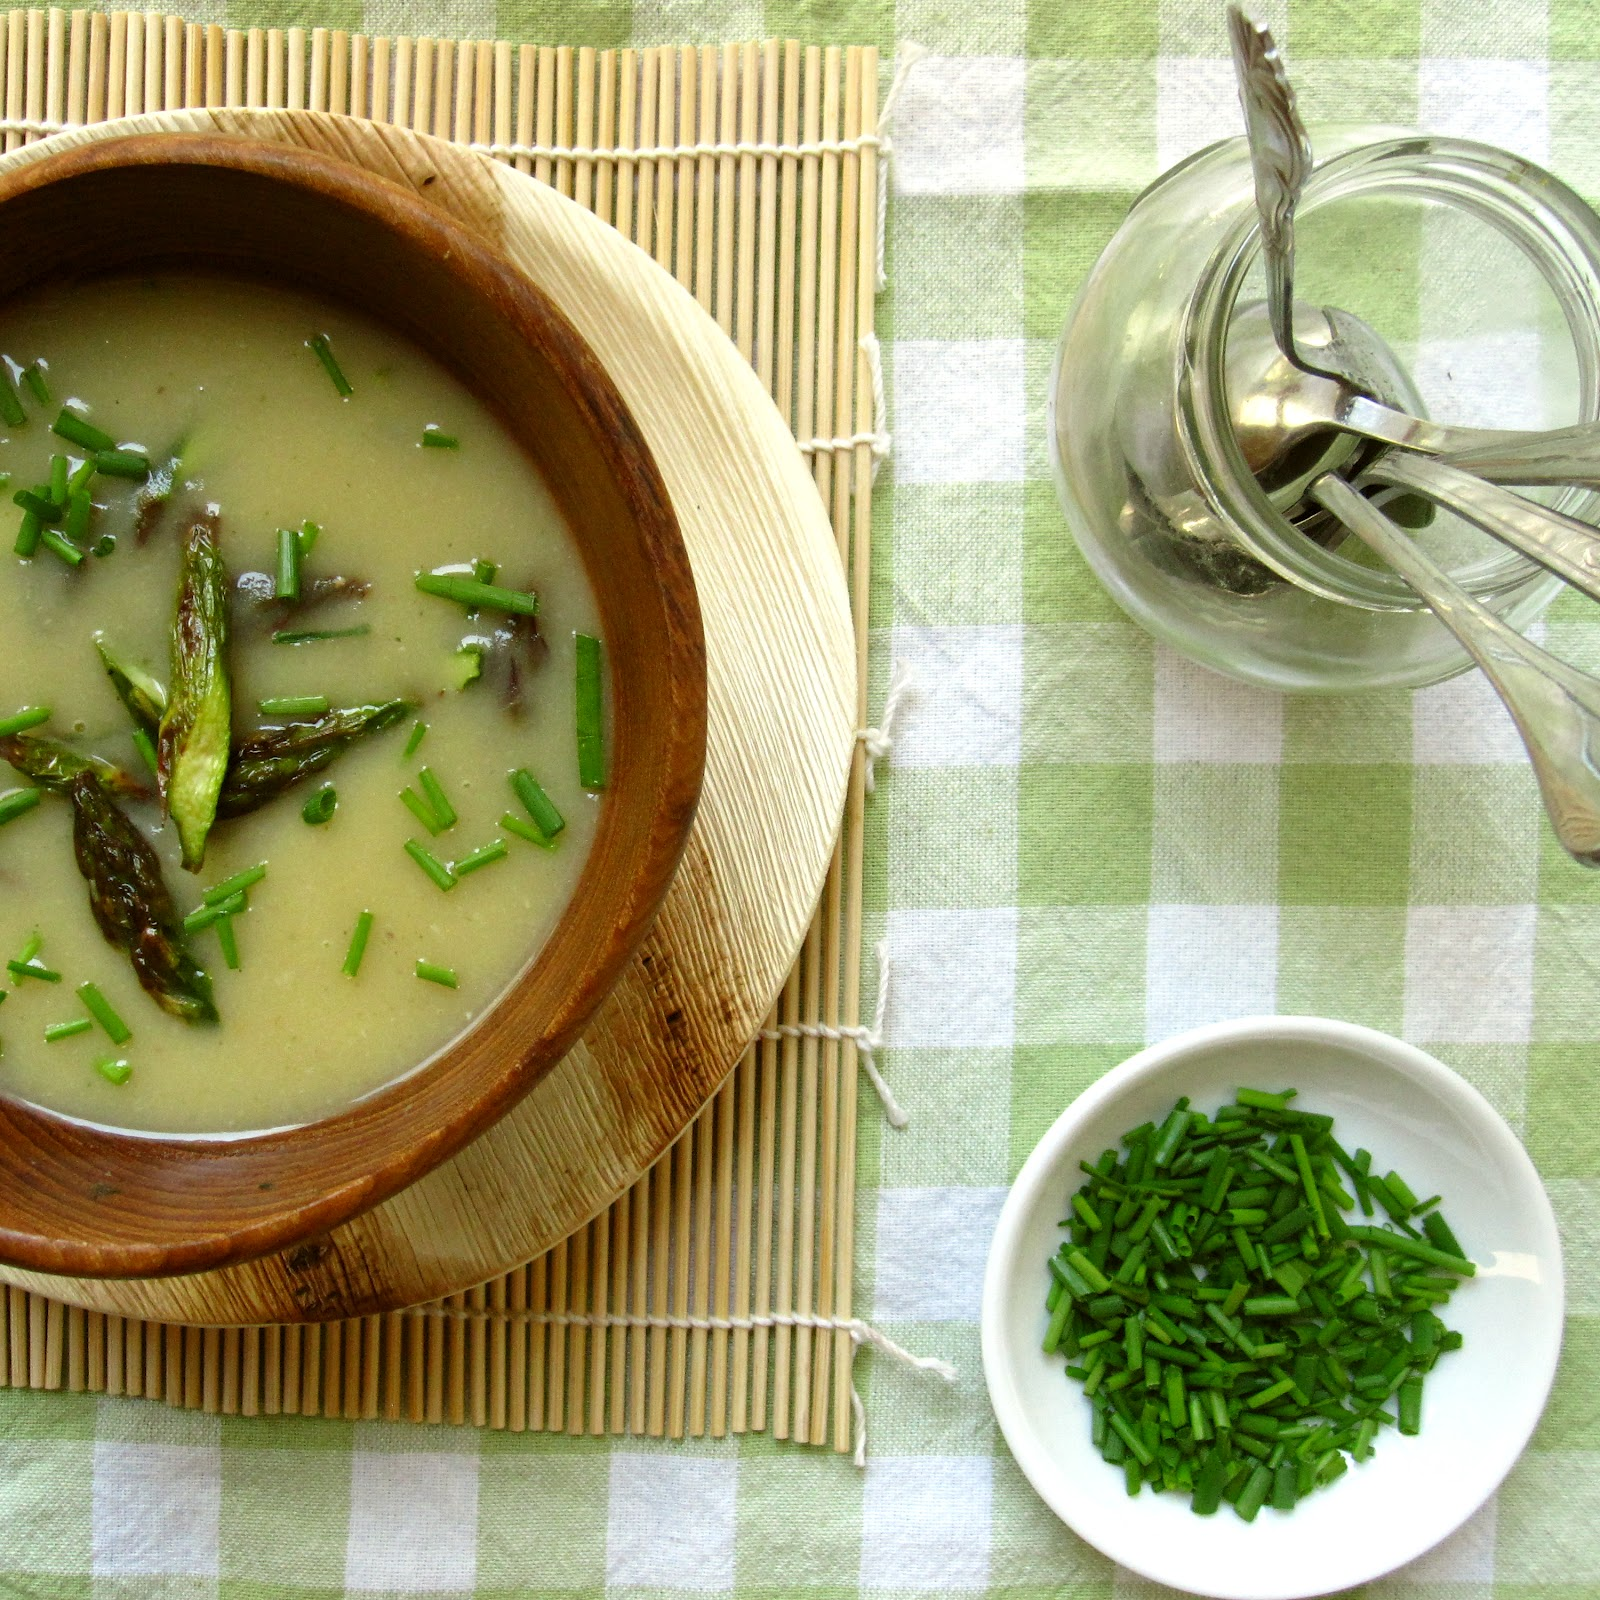 Soup Recipes Asparagus: Edible Biology: Creamy Roasted Asparagus Soup